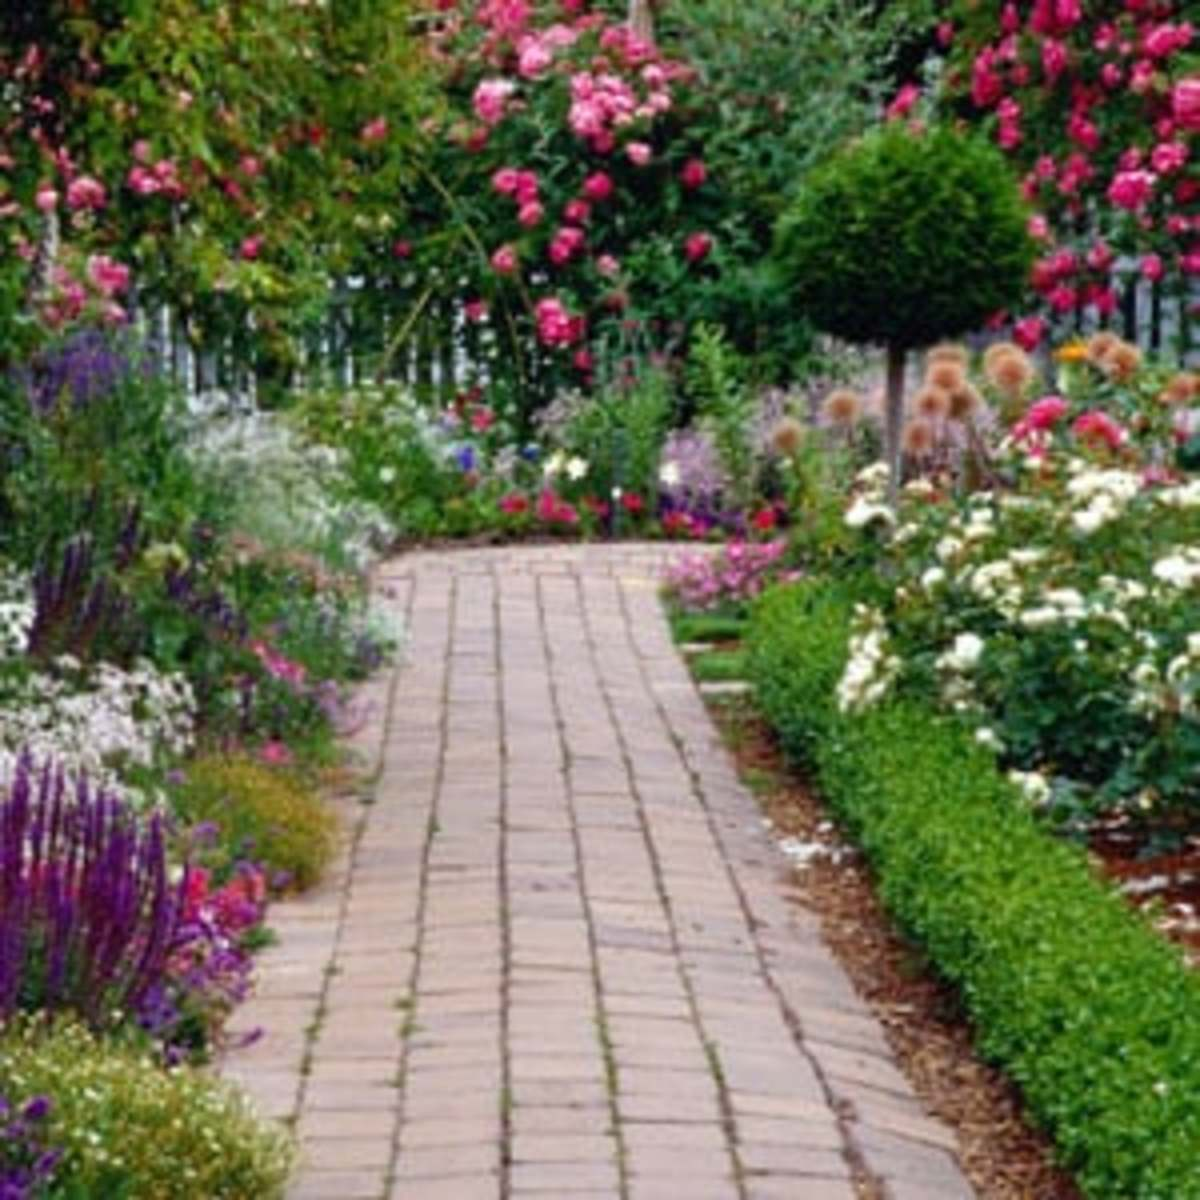 Bricks or pavers make an interesting walkway between flower beds.